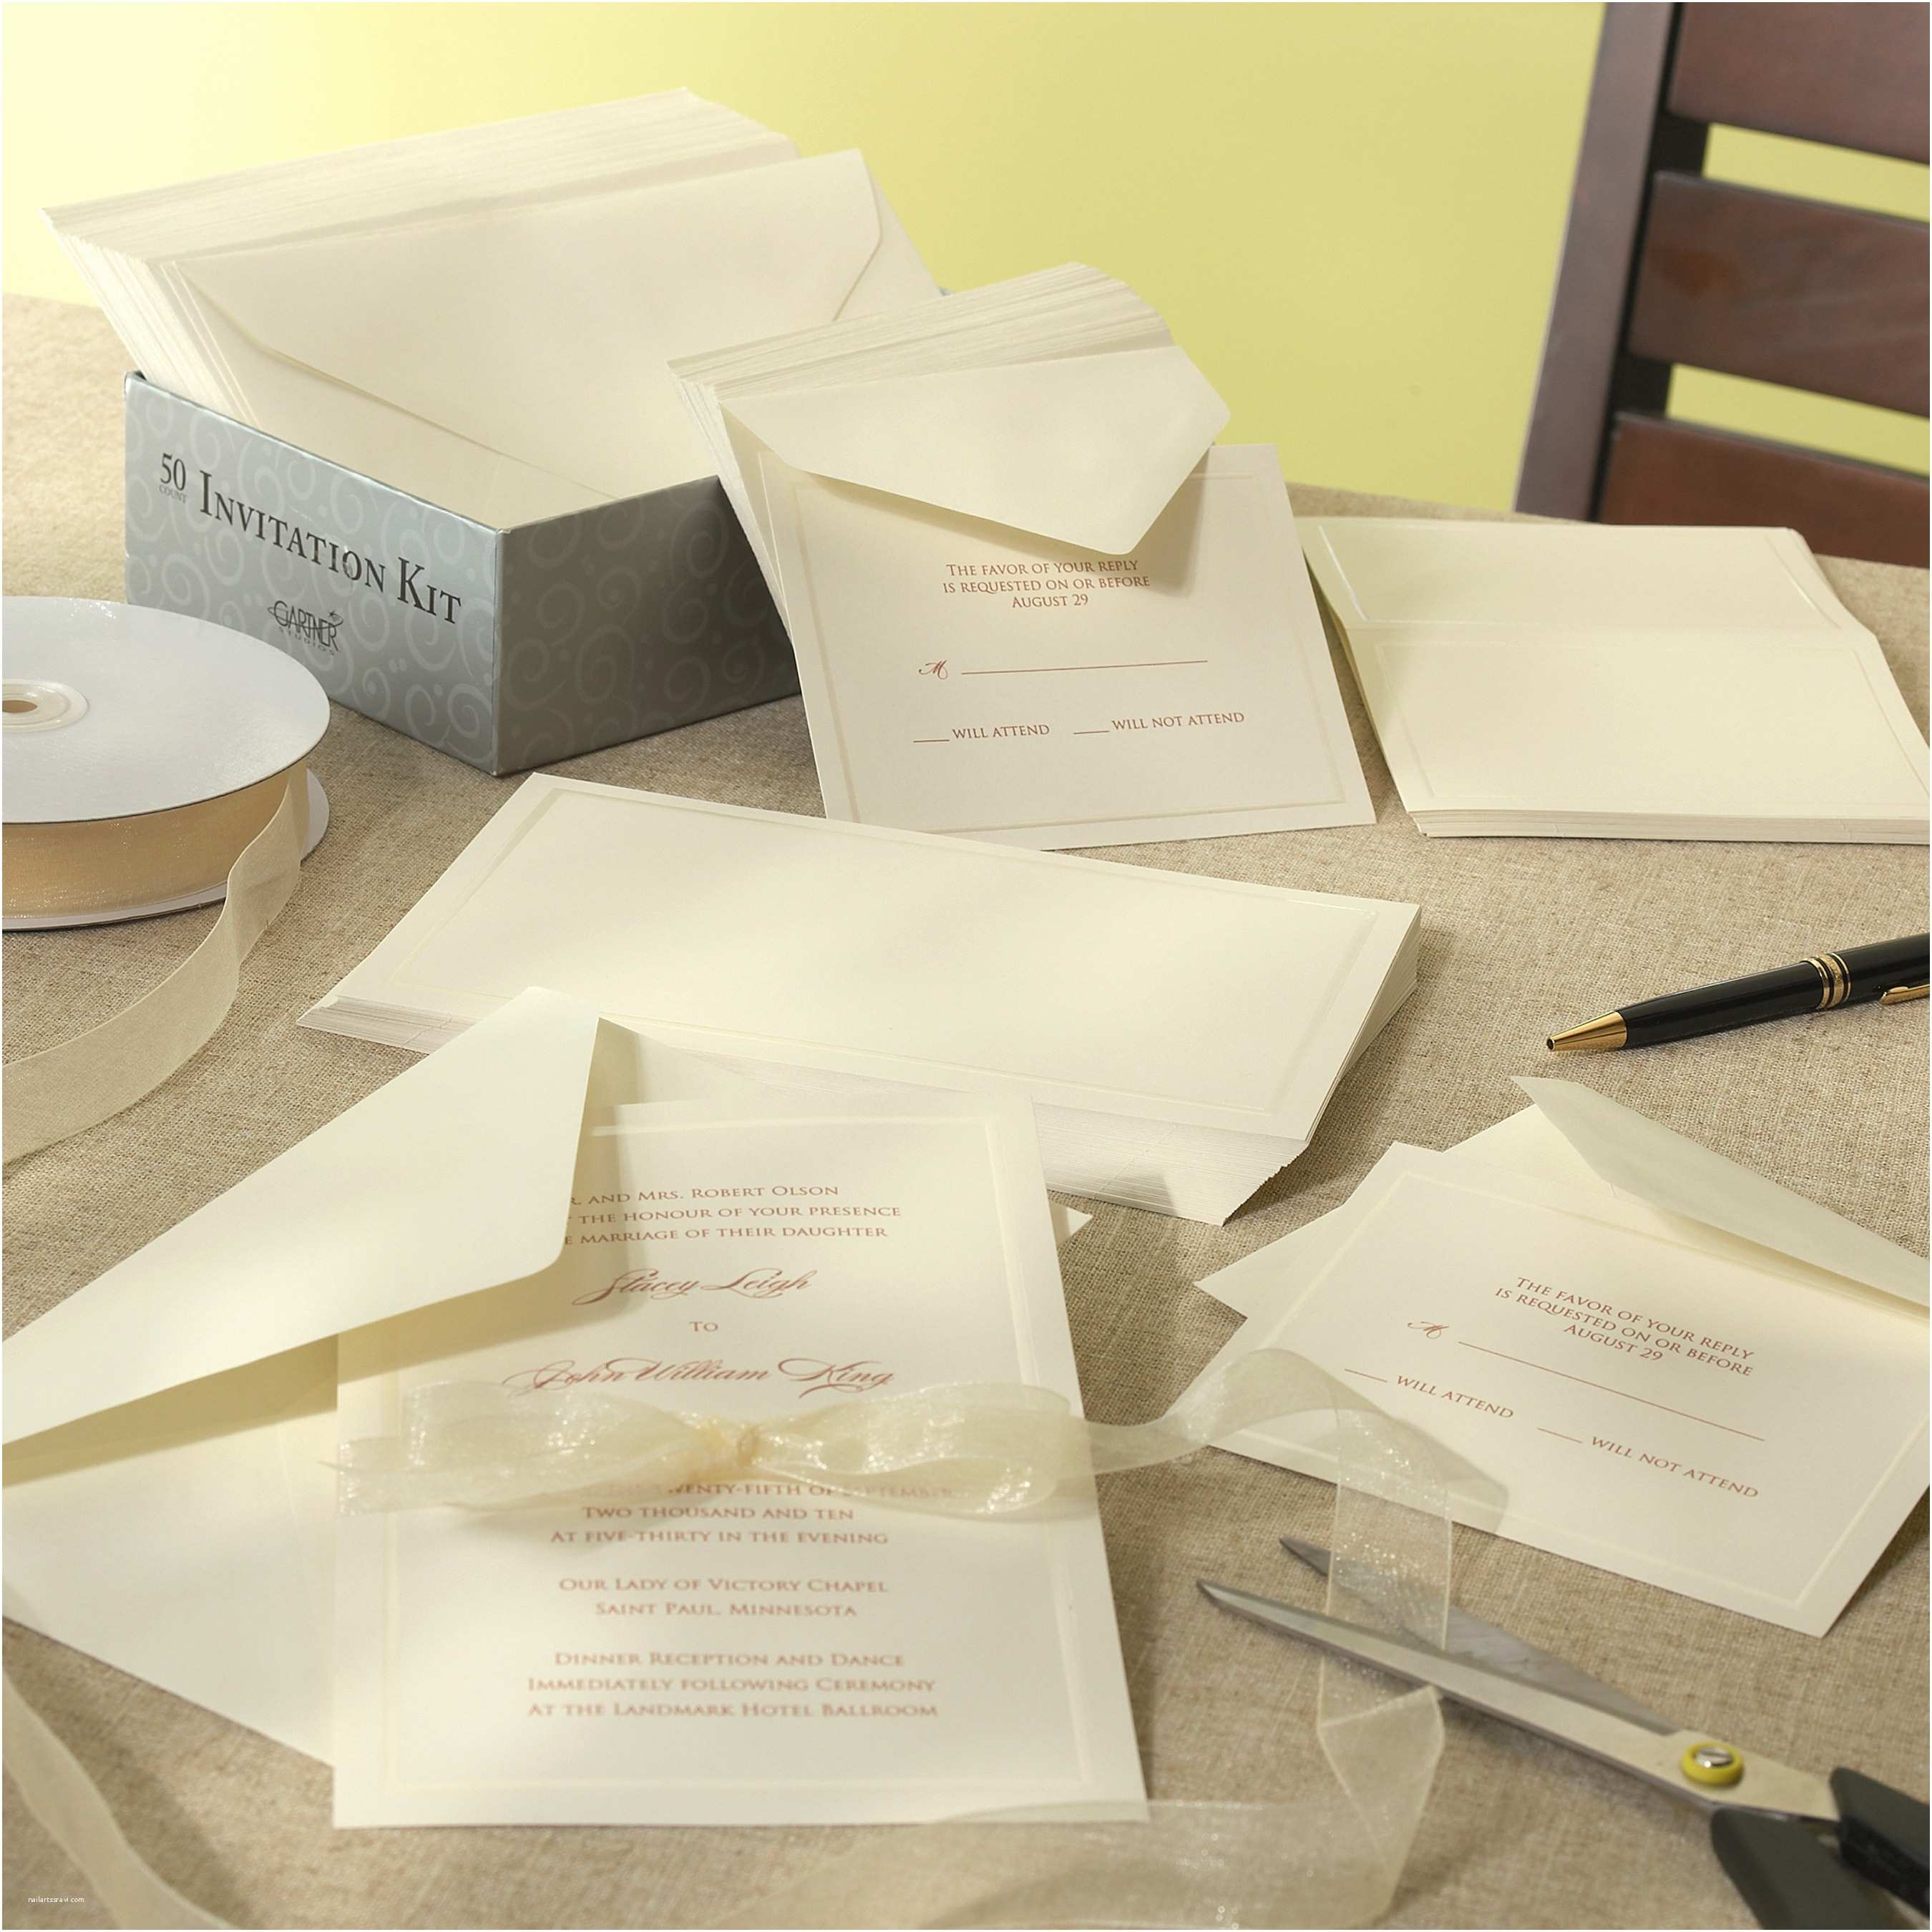 Buy Wedding Invitation Kits Diy Wedding Invitations Kits Do It Yourself Wedding Invitation Kits Various Invitation Card Design